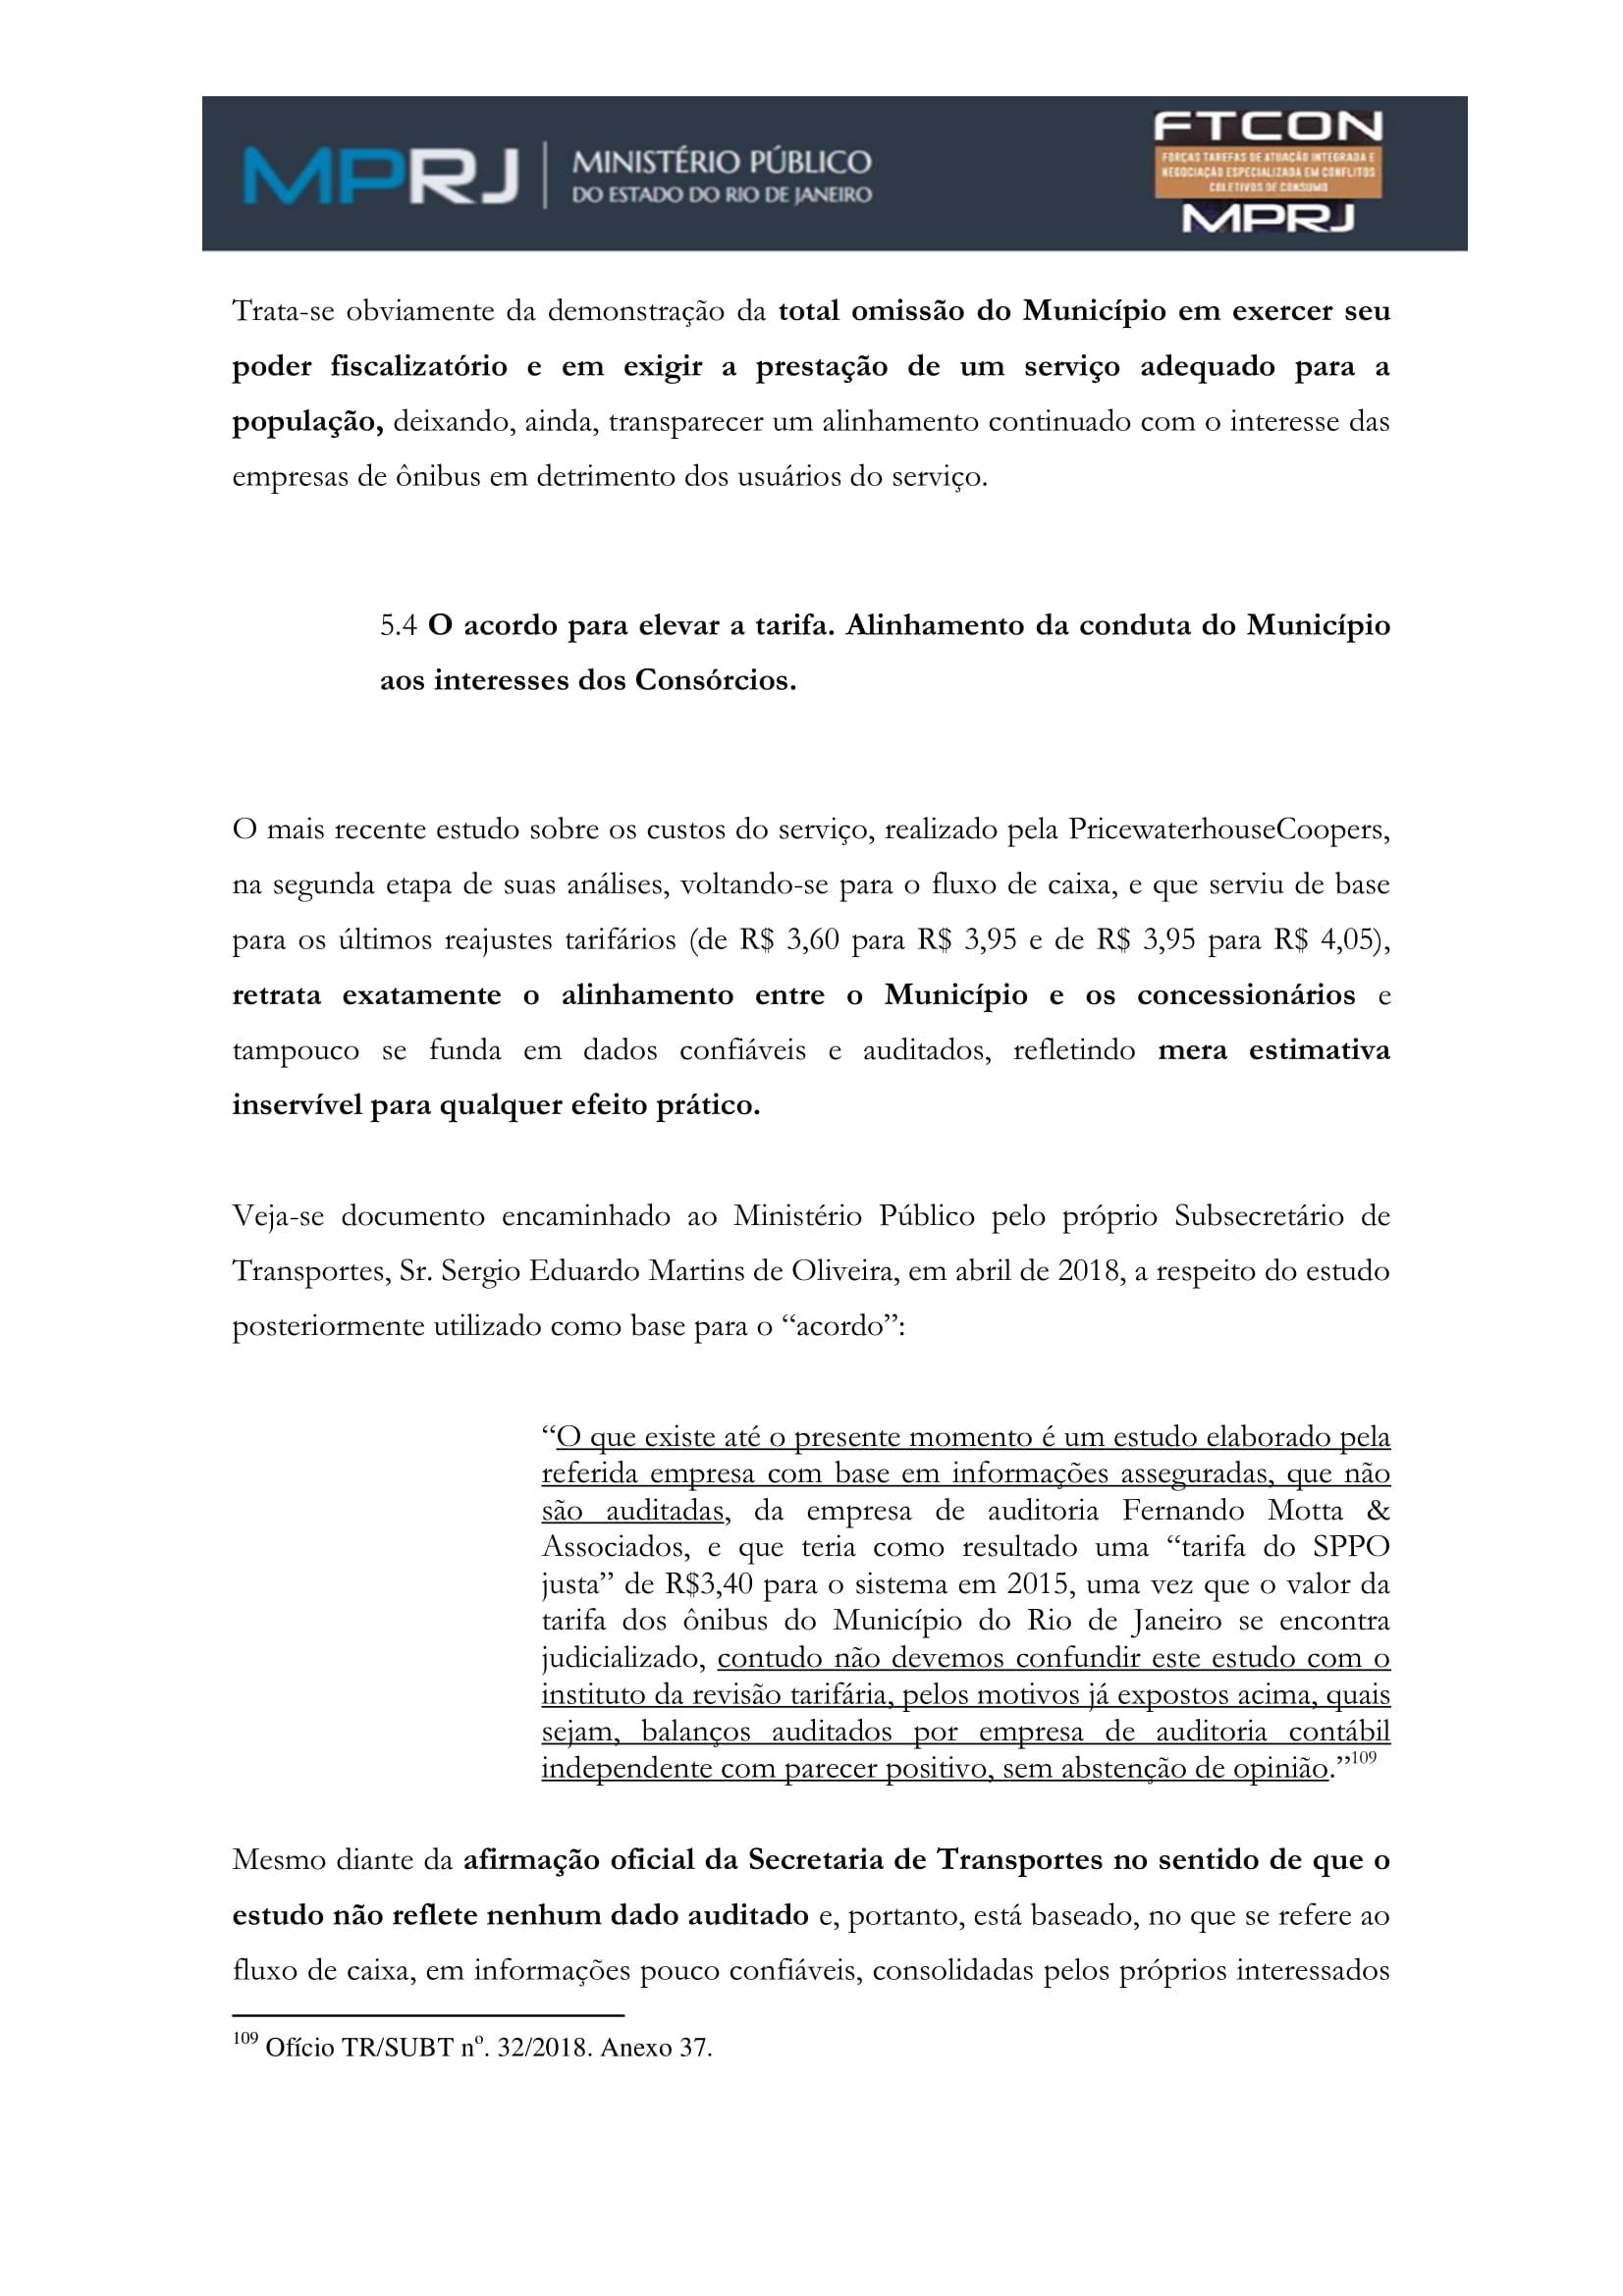 acp_caducidade_onibus_dr_rt-115